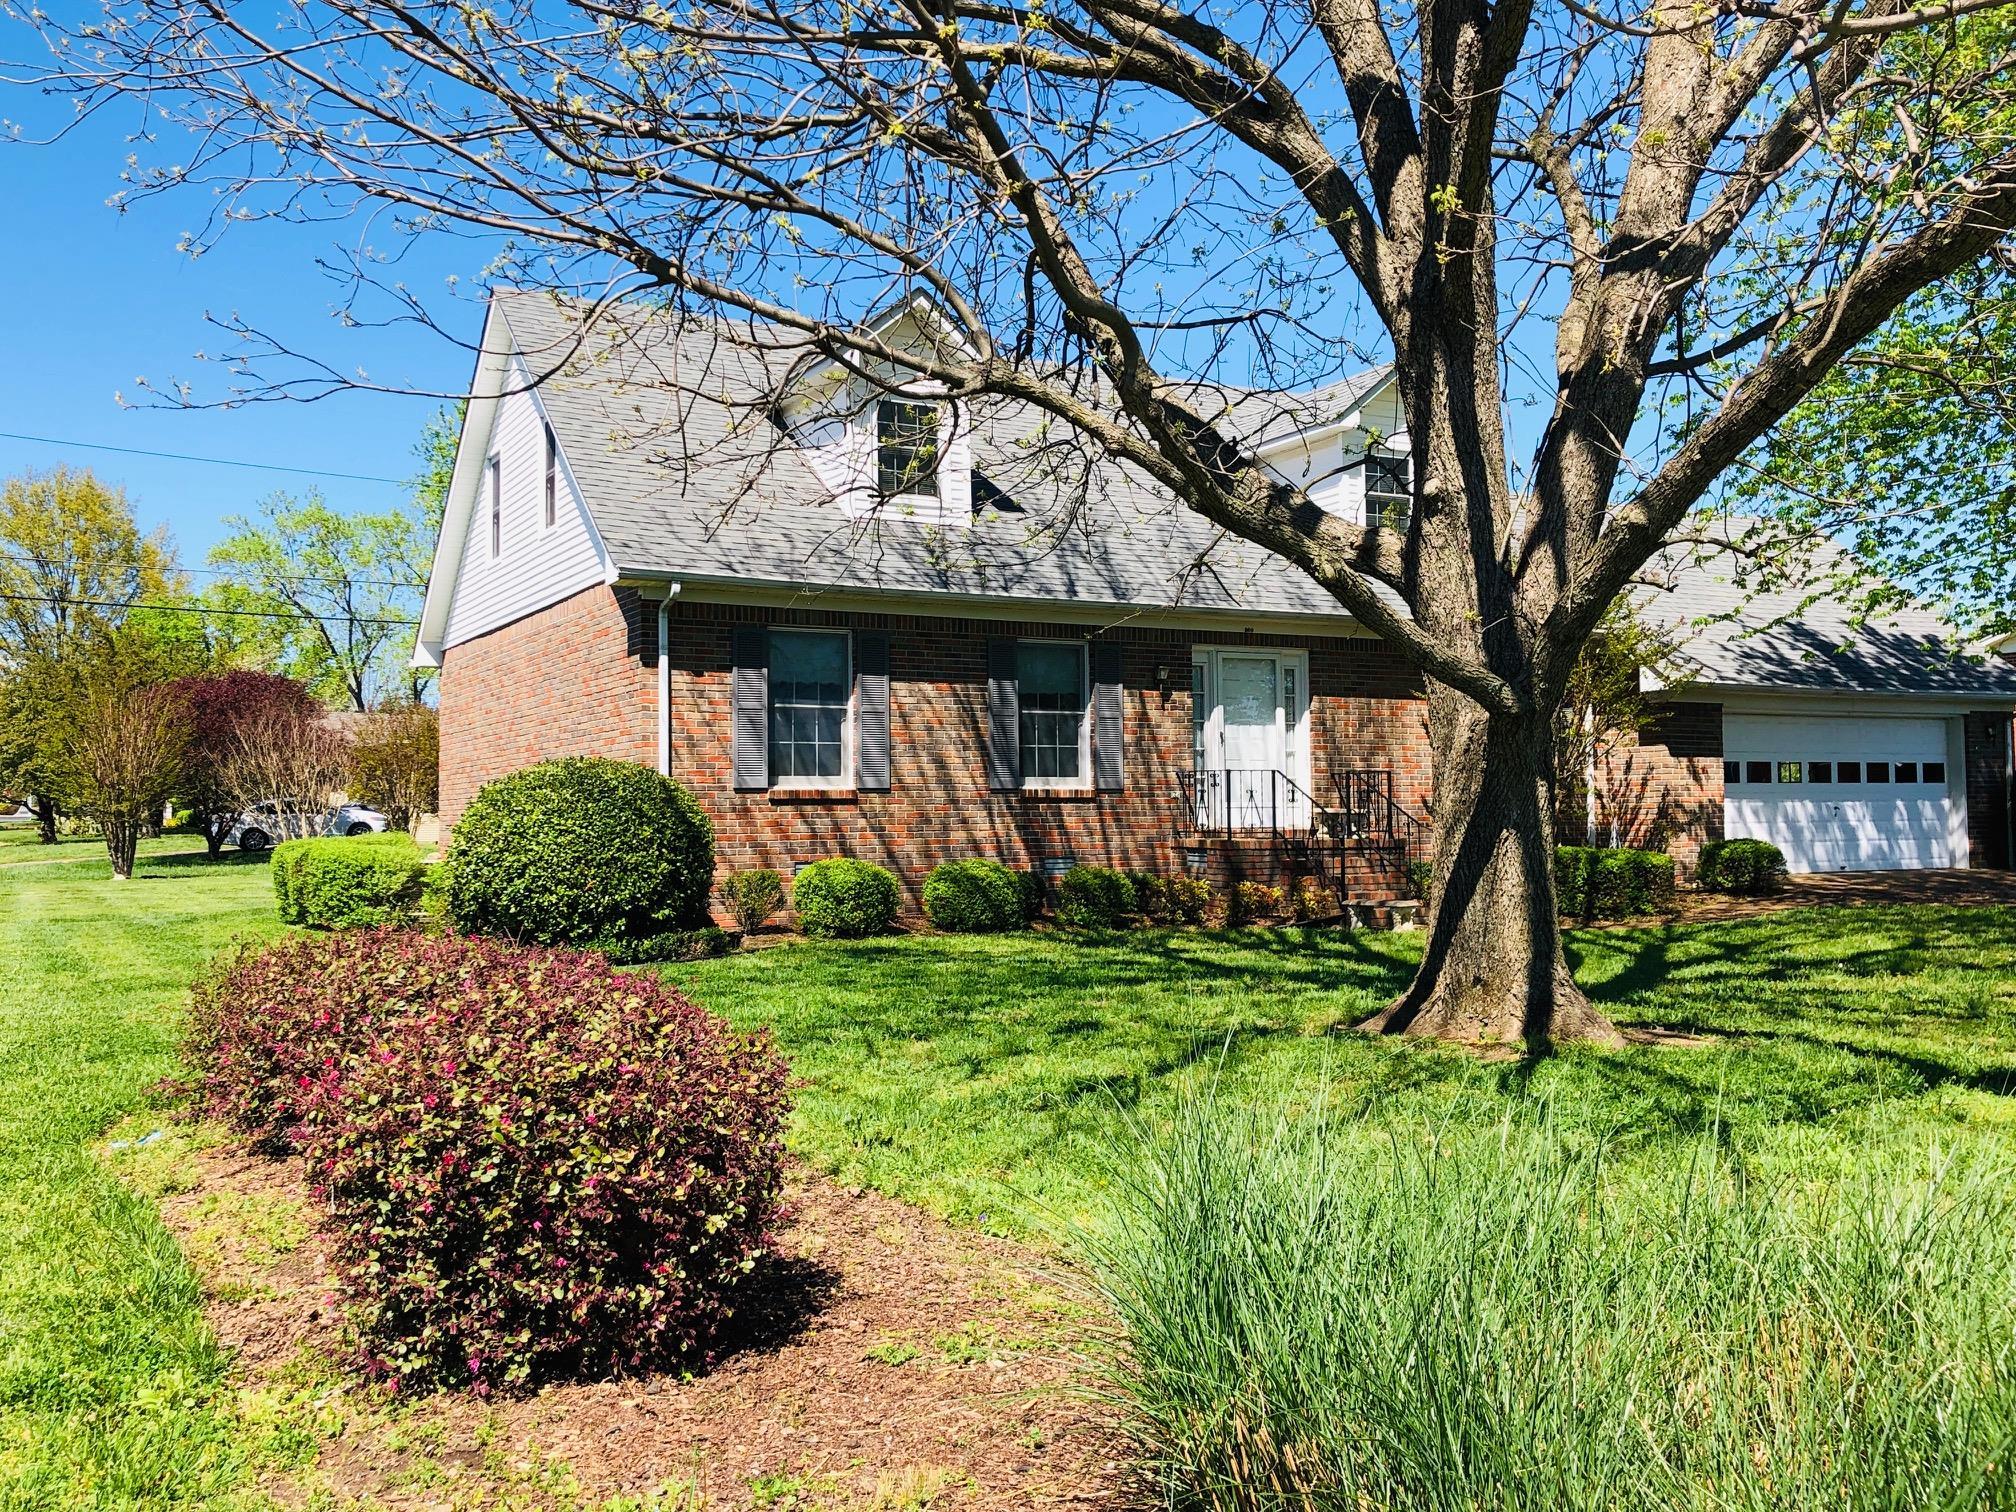 500 8Th St, Lawrenceburg, TN 38464 - Lawrenceburg, TN real estate listing